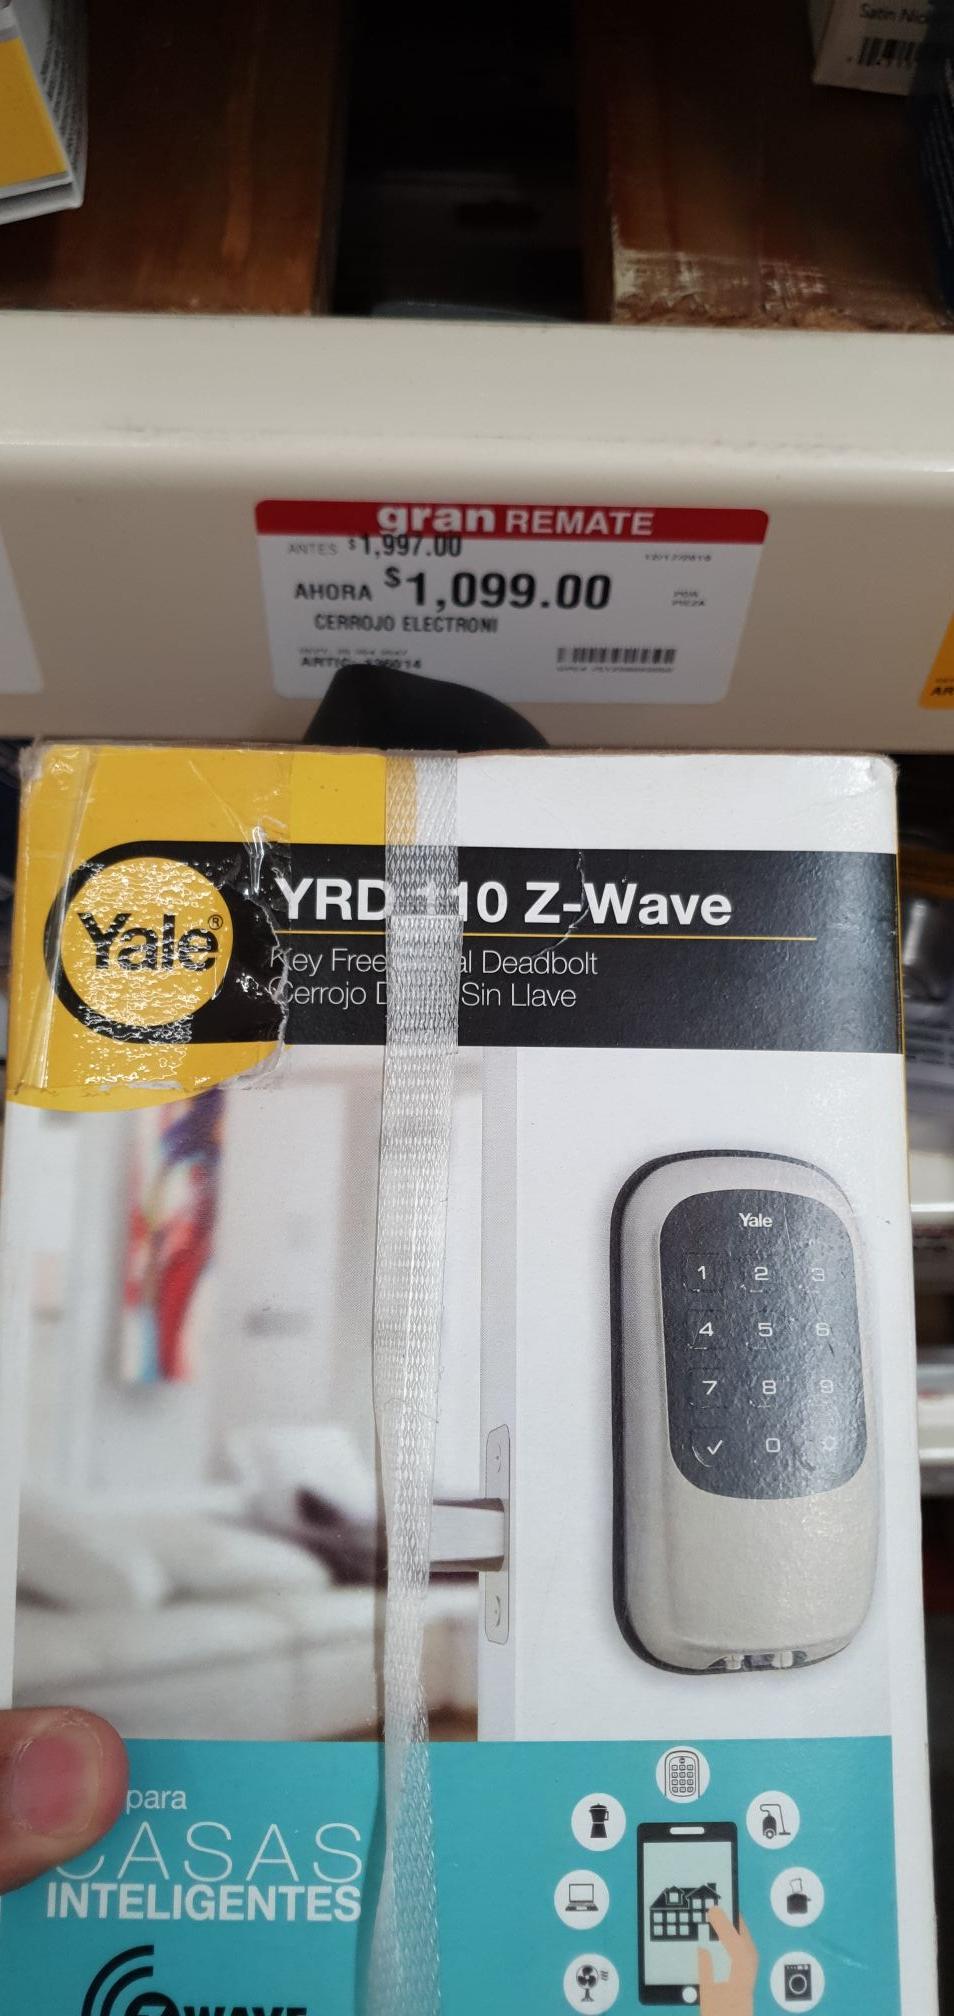 Home Depot SLP: Cerradura Inteligente Yale YRD 110 Z-Wave